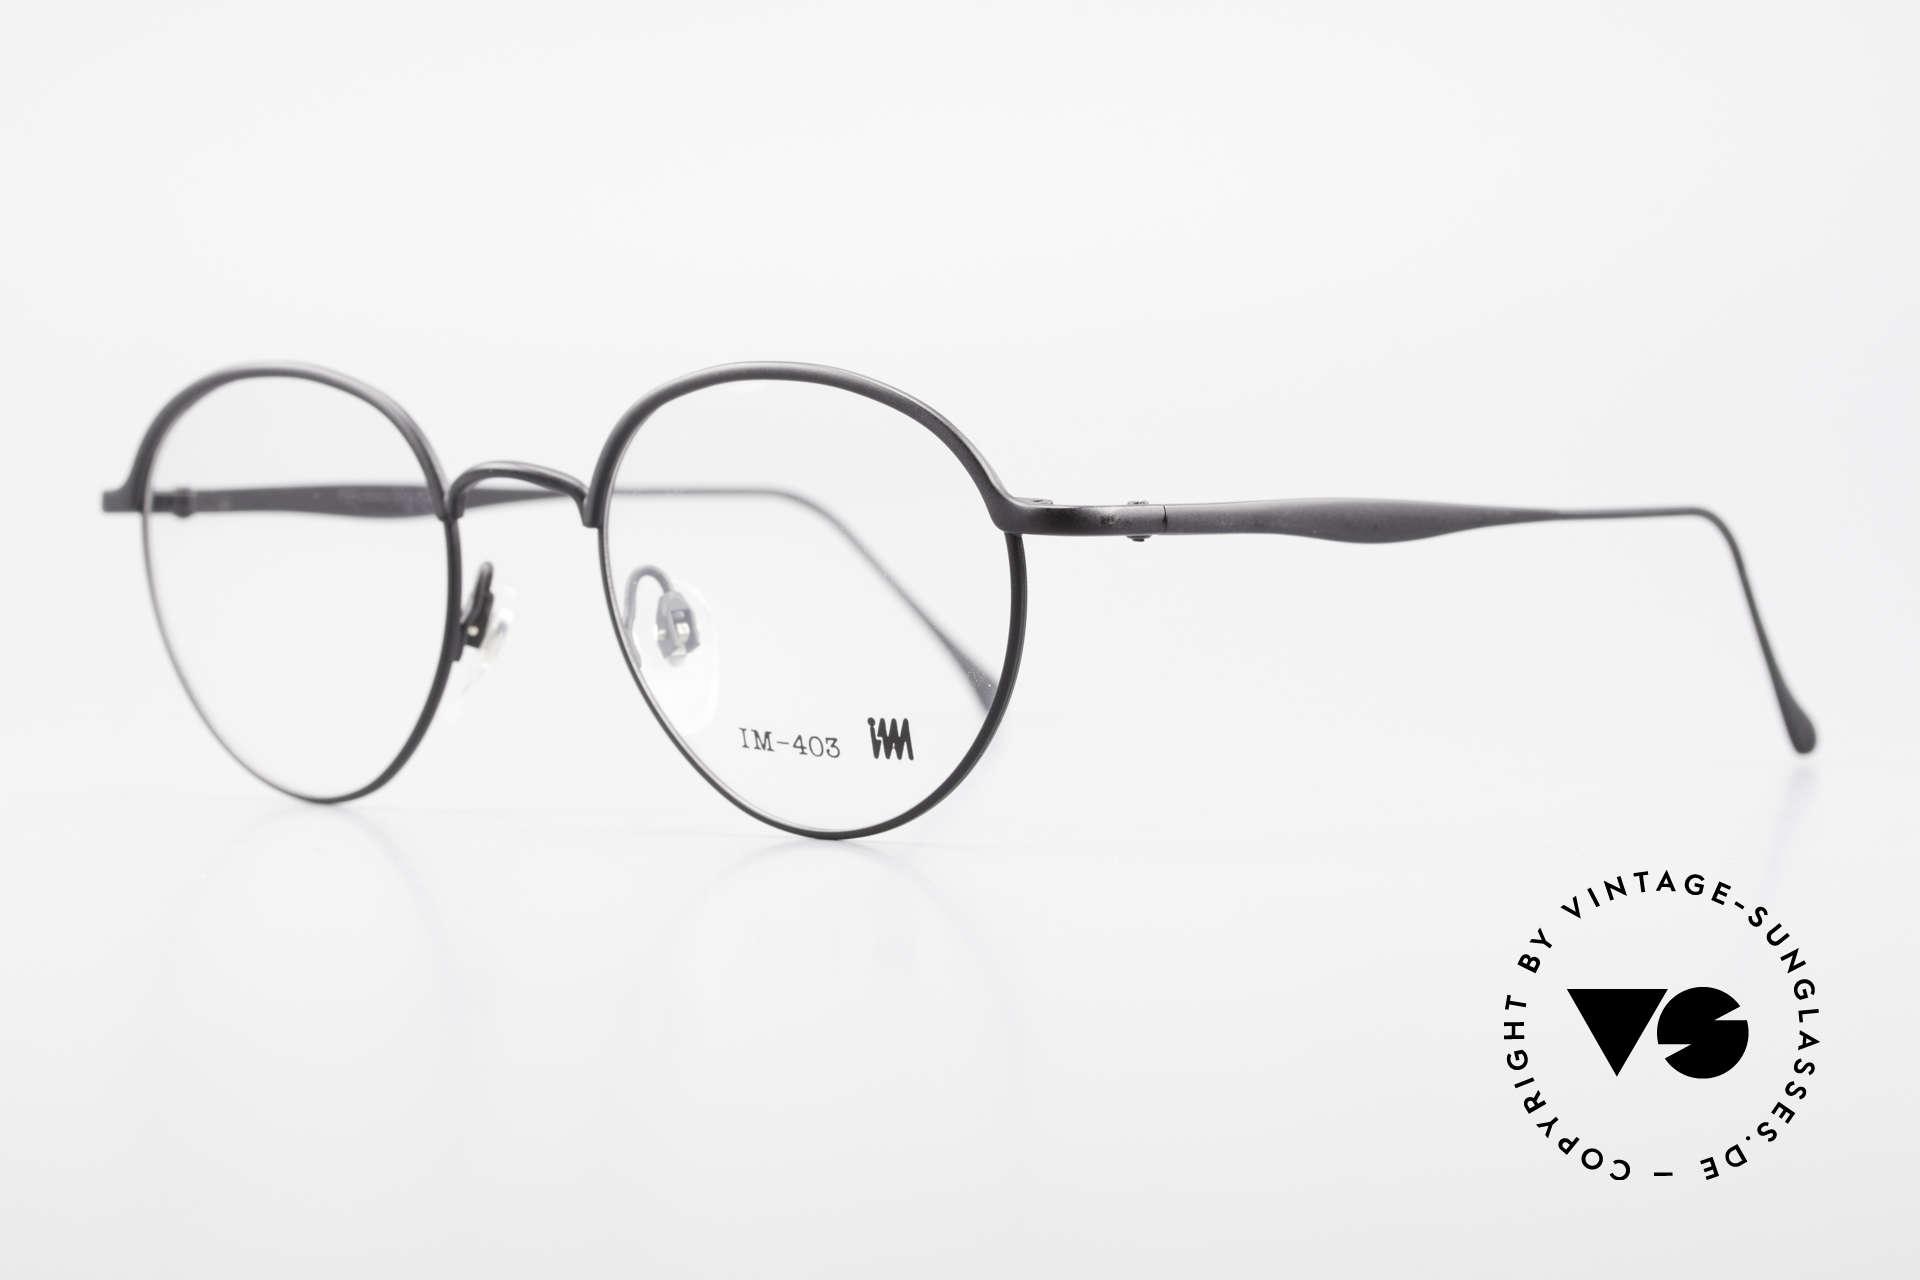 Miyake Design Studio IM403 Connoisseur Panto Glasses 90's, MIYAKE Design Studio = Issey Miyake = I.M. 403, Made for Men and Women